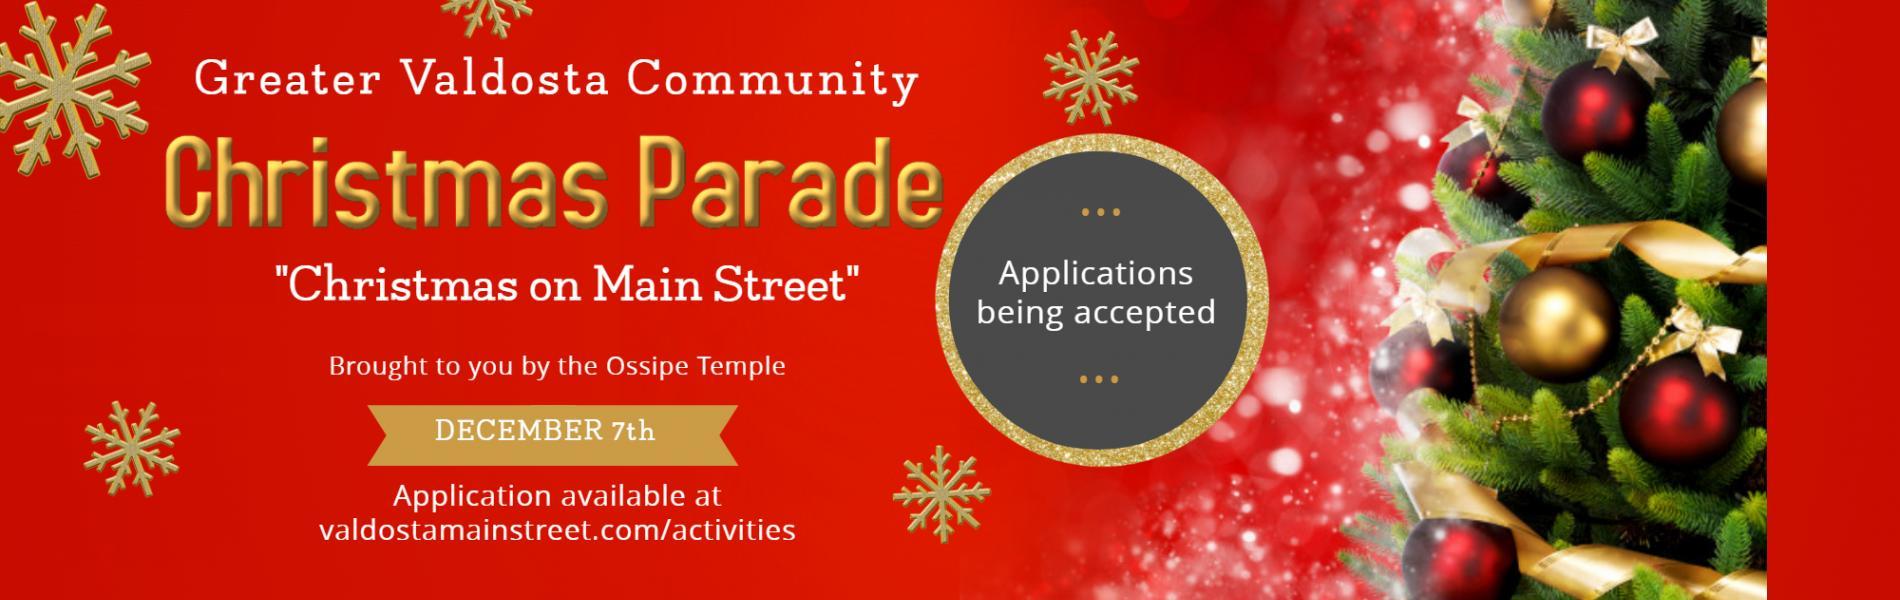 Valdosta Ga Christmas Parade 2019 Greater Valdosta Community Christmas Parade | Valdosta, GA   Main